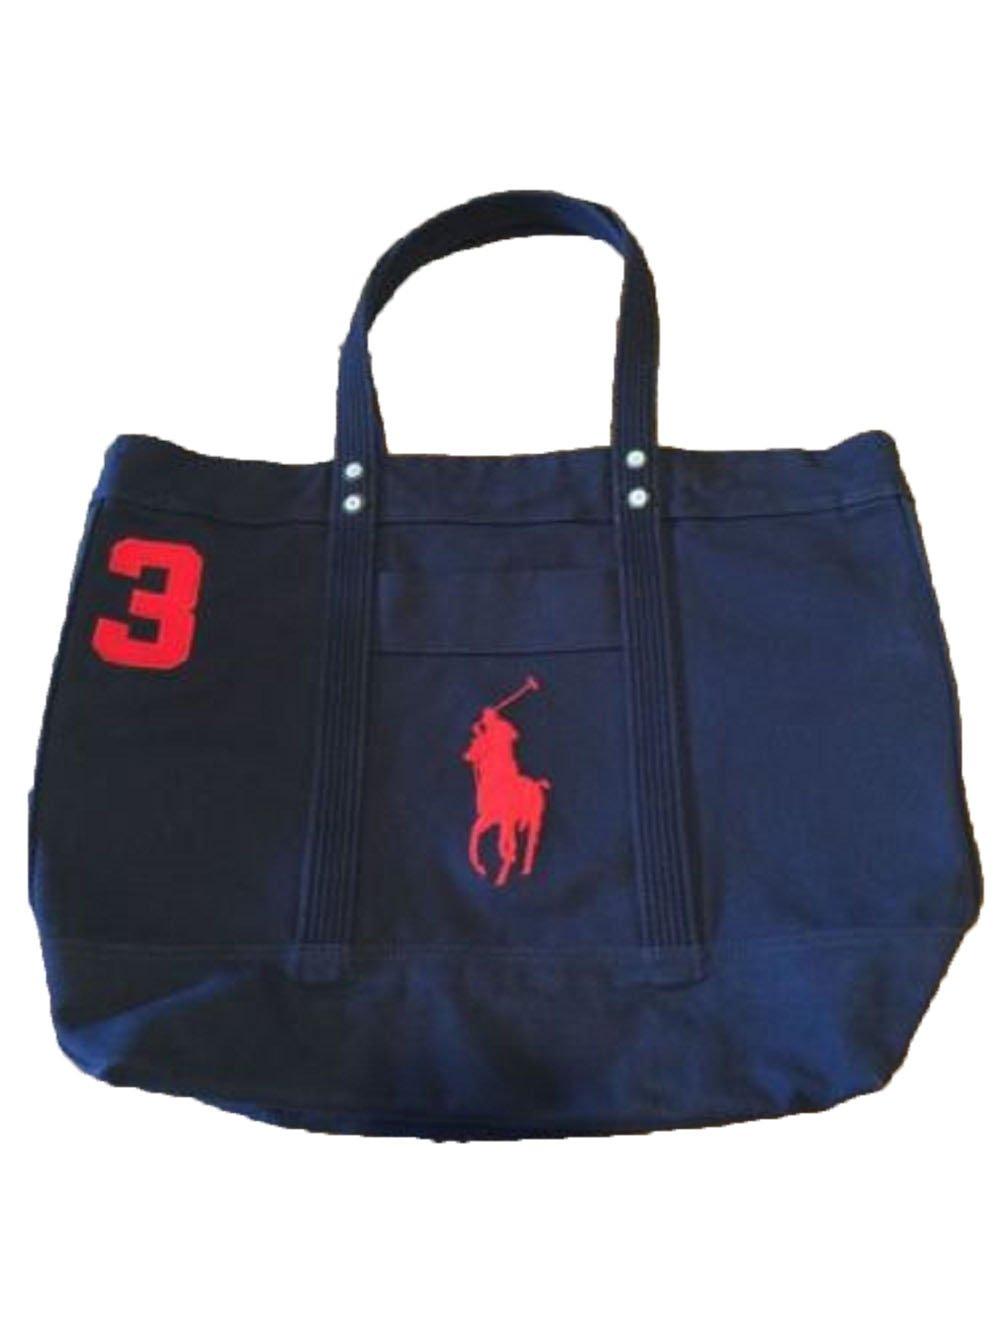 Polo Ralph Lauren Cotton Canvas Big Pony Zip Tote Bag (Aviator Navy)